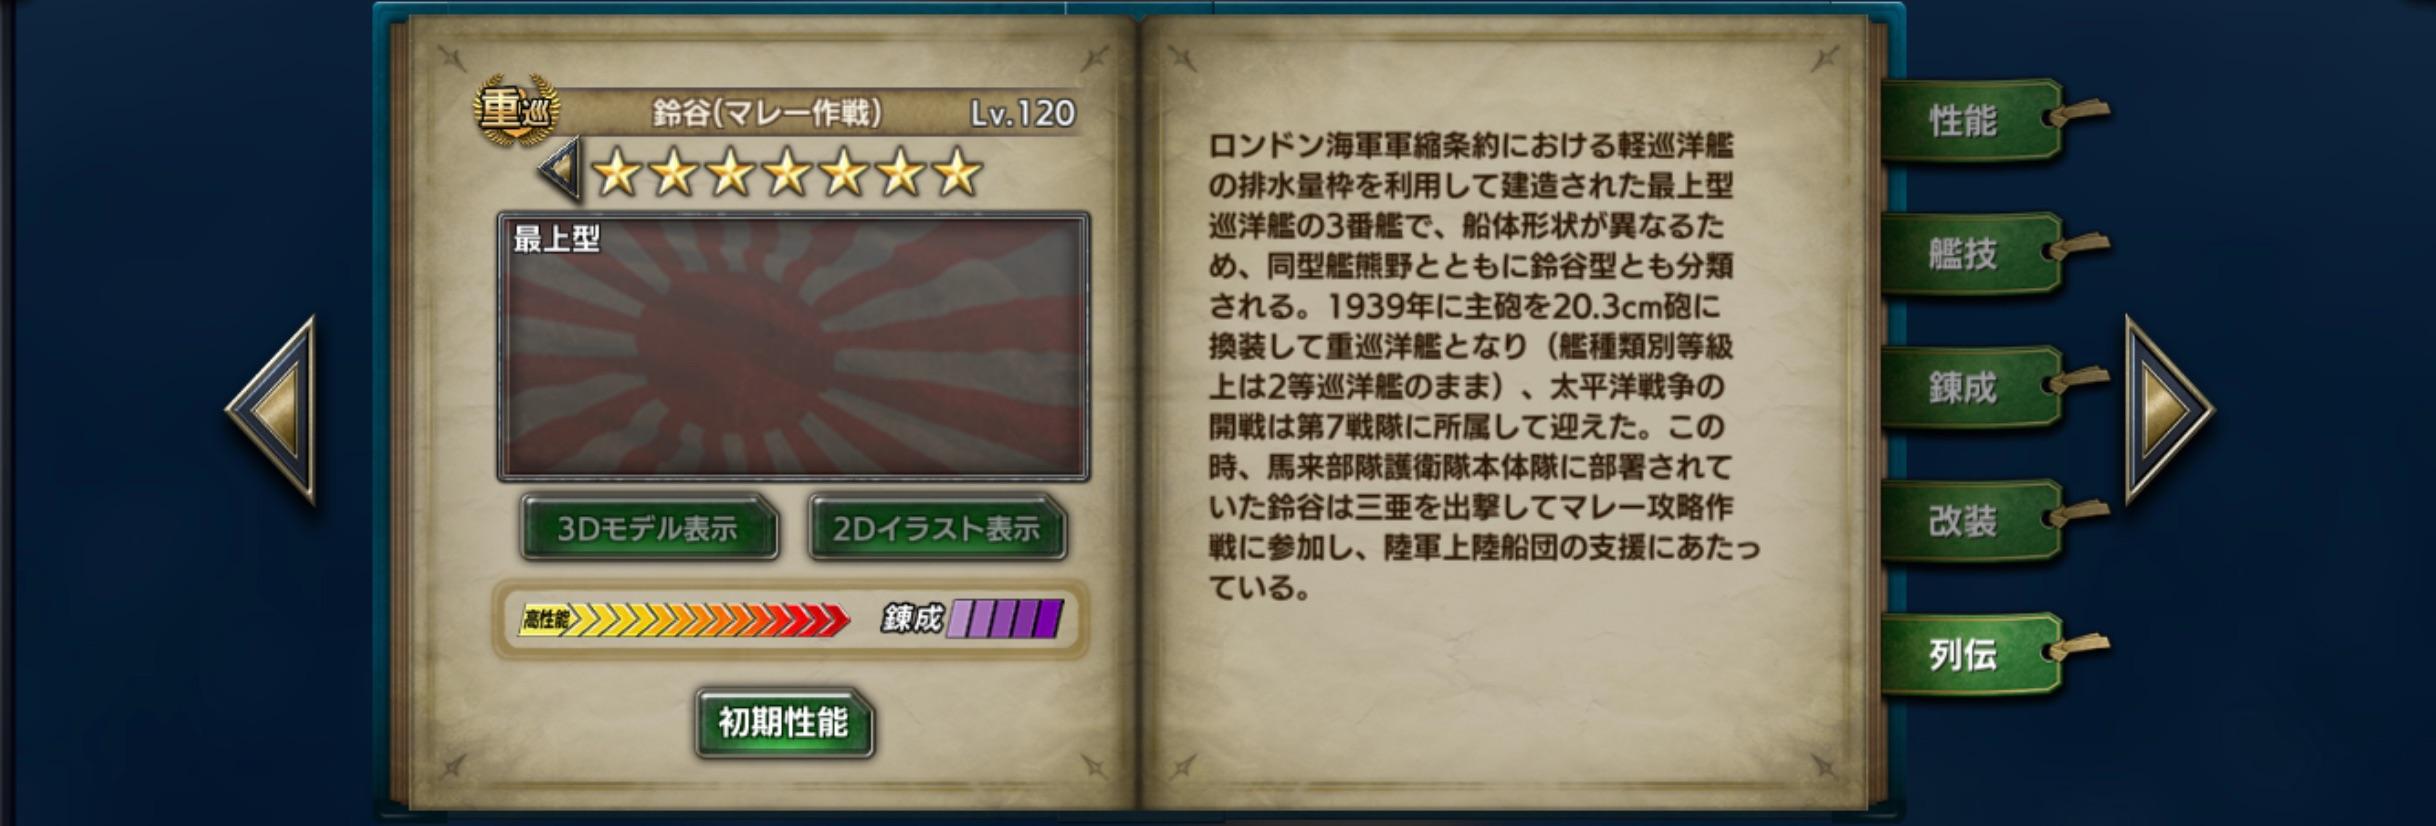 SuzuyaM-history